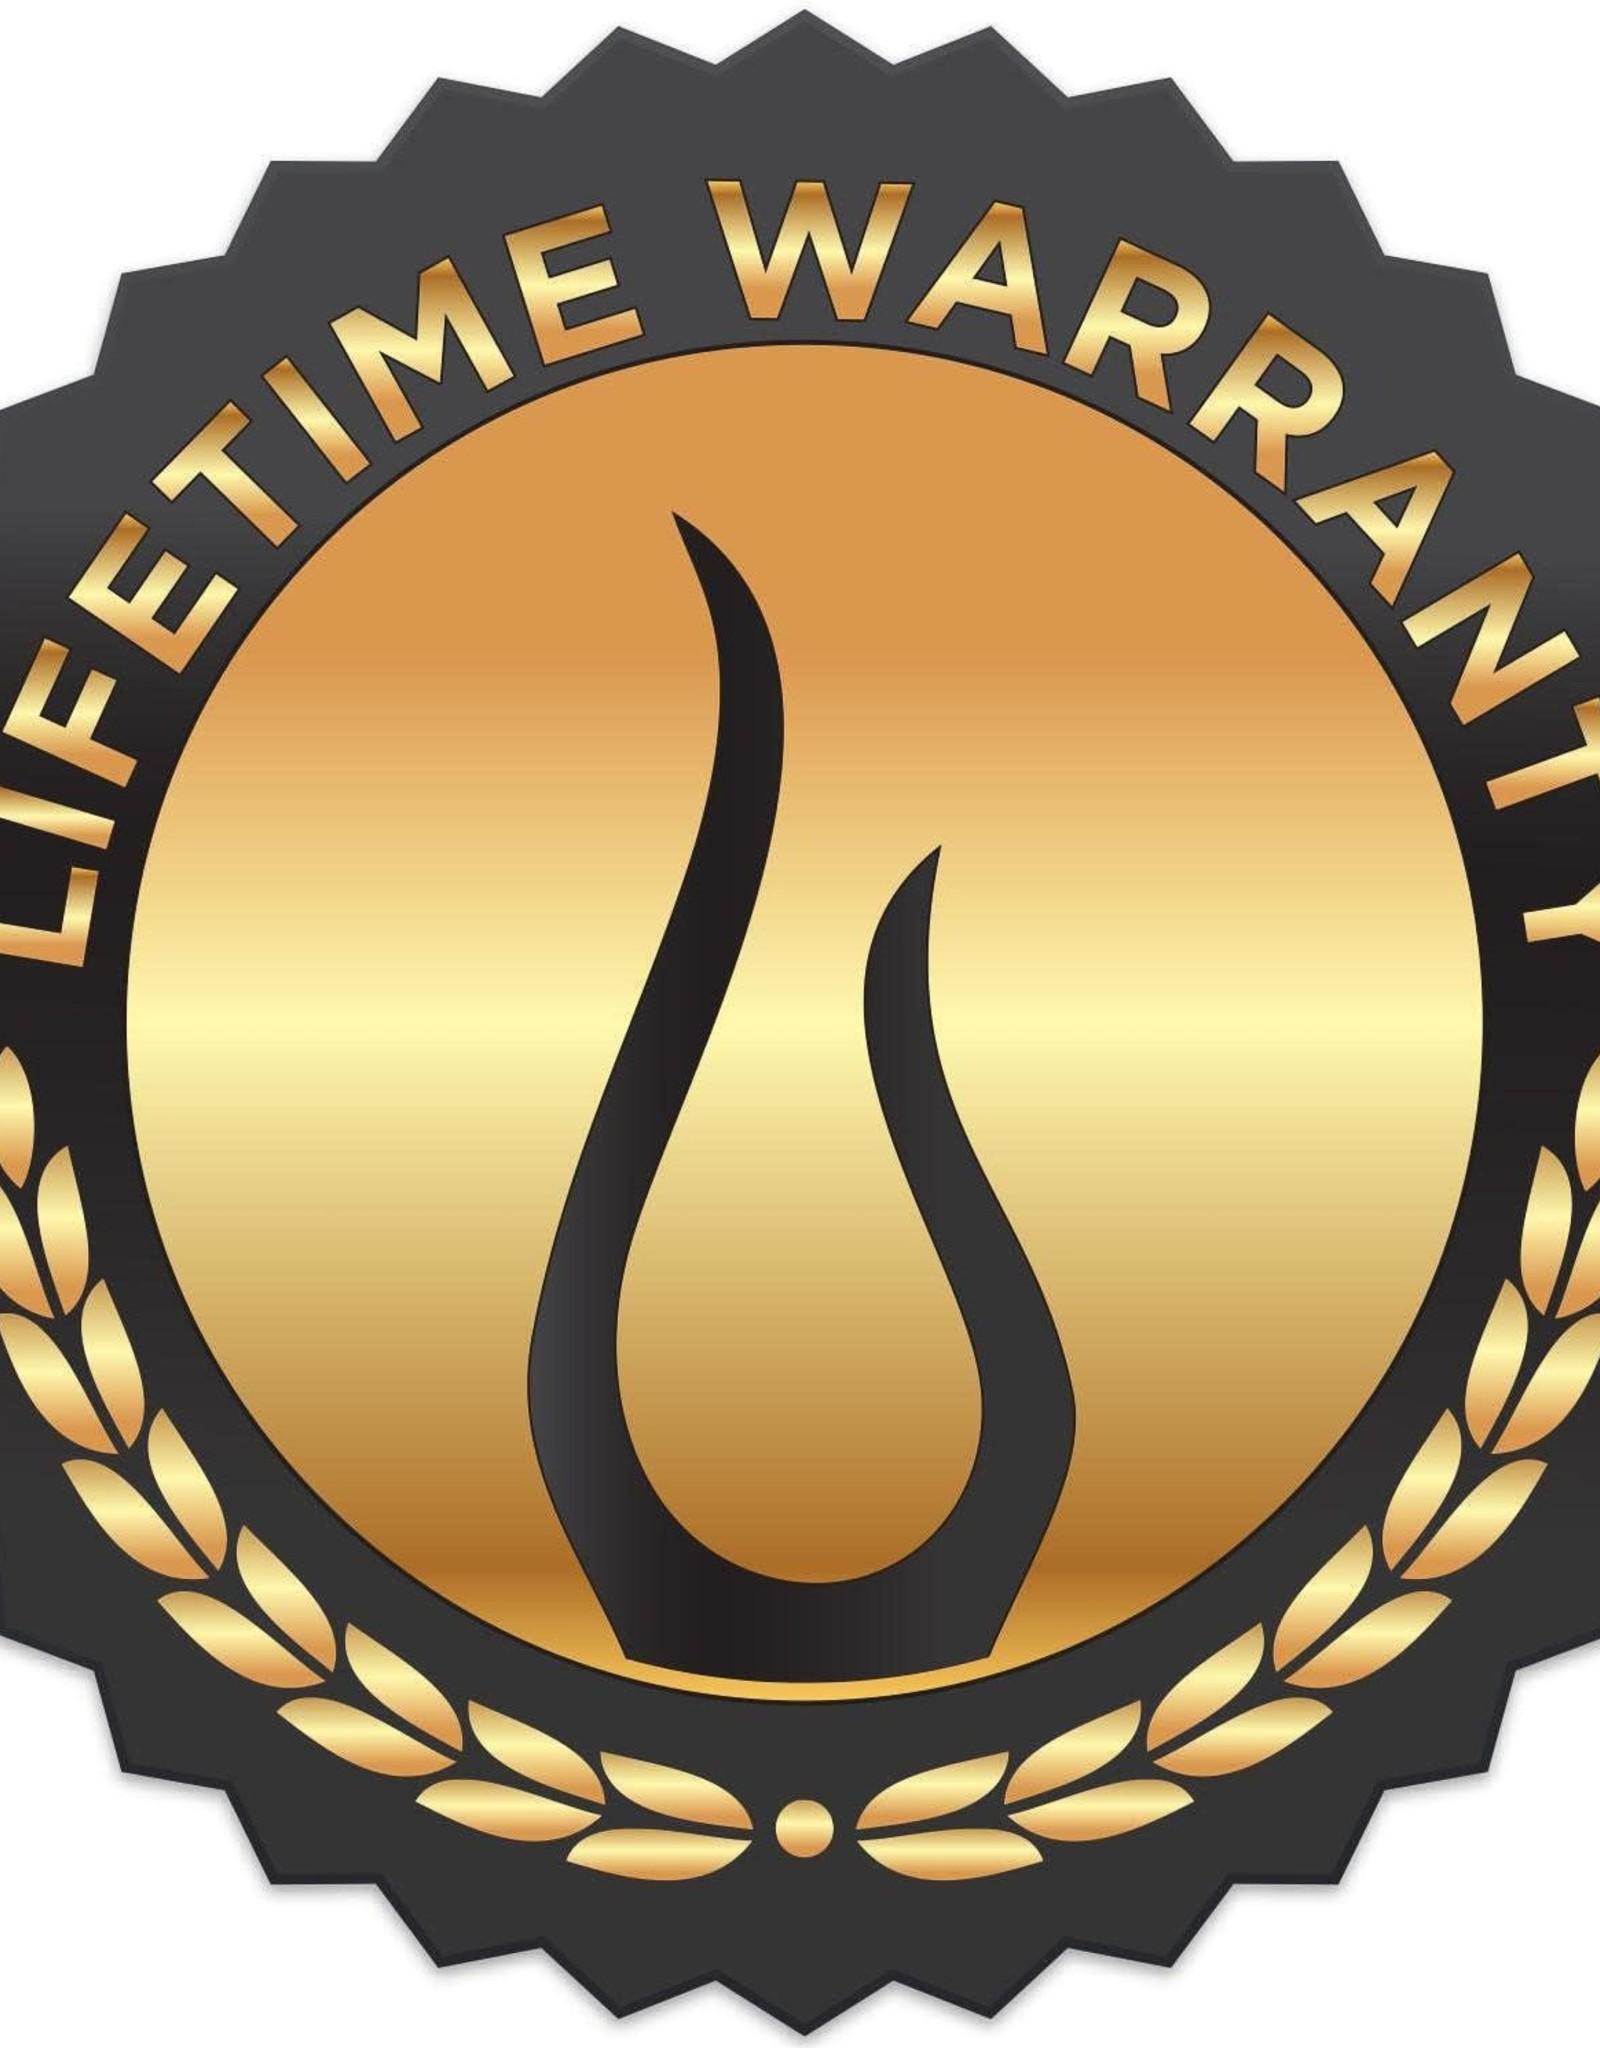 Blaze Outdoor Products Blaze Insulated Jacket For 32-Inch 4-Burner Gas Grills - BLZ-4-IJ